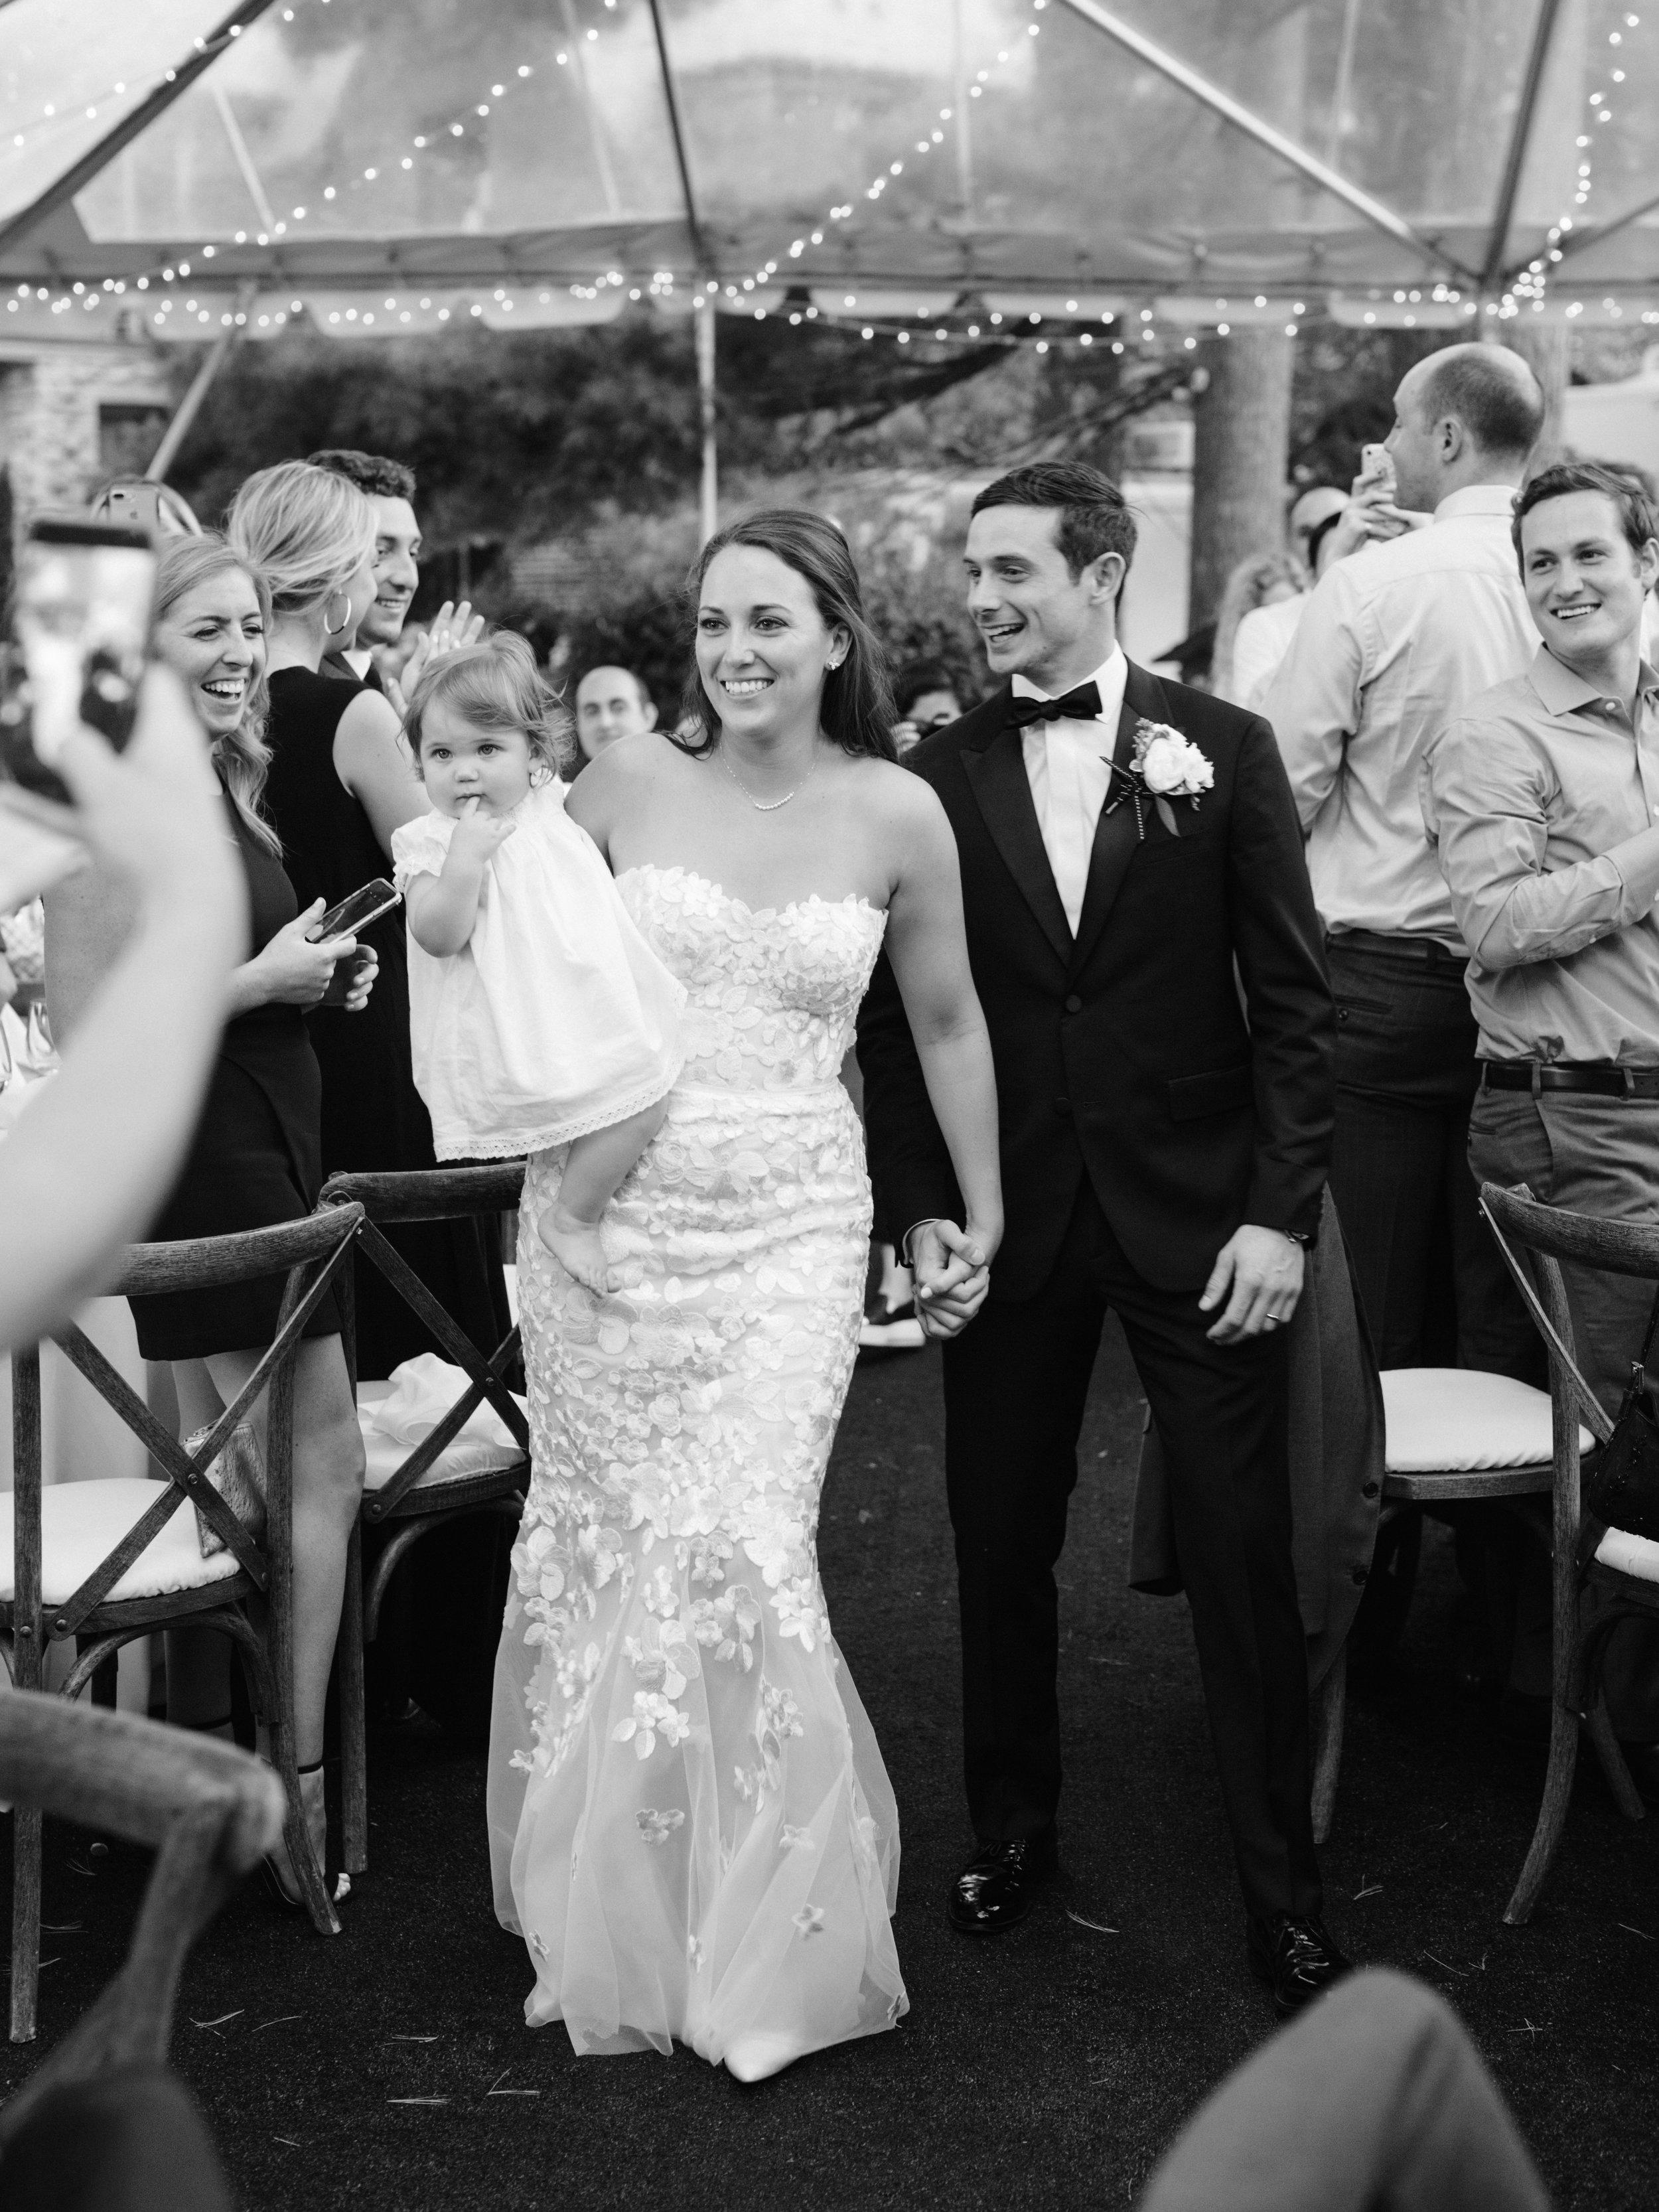 Kyle John l Fine Art Wedding Photography l Chicago, Copenhagen, California, New York, Destination l Blog l Kate and Michael_Winnetka_36